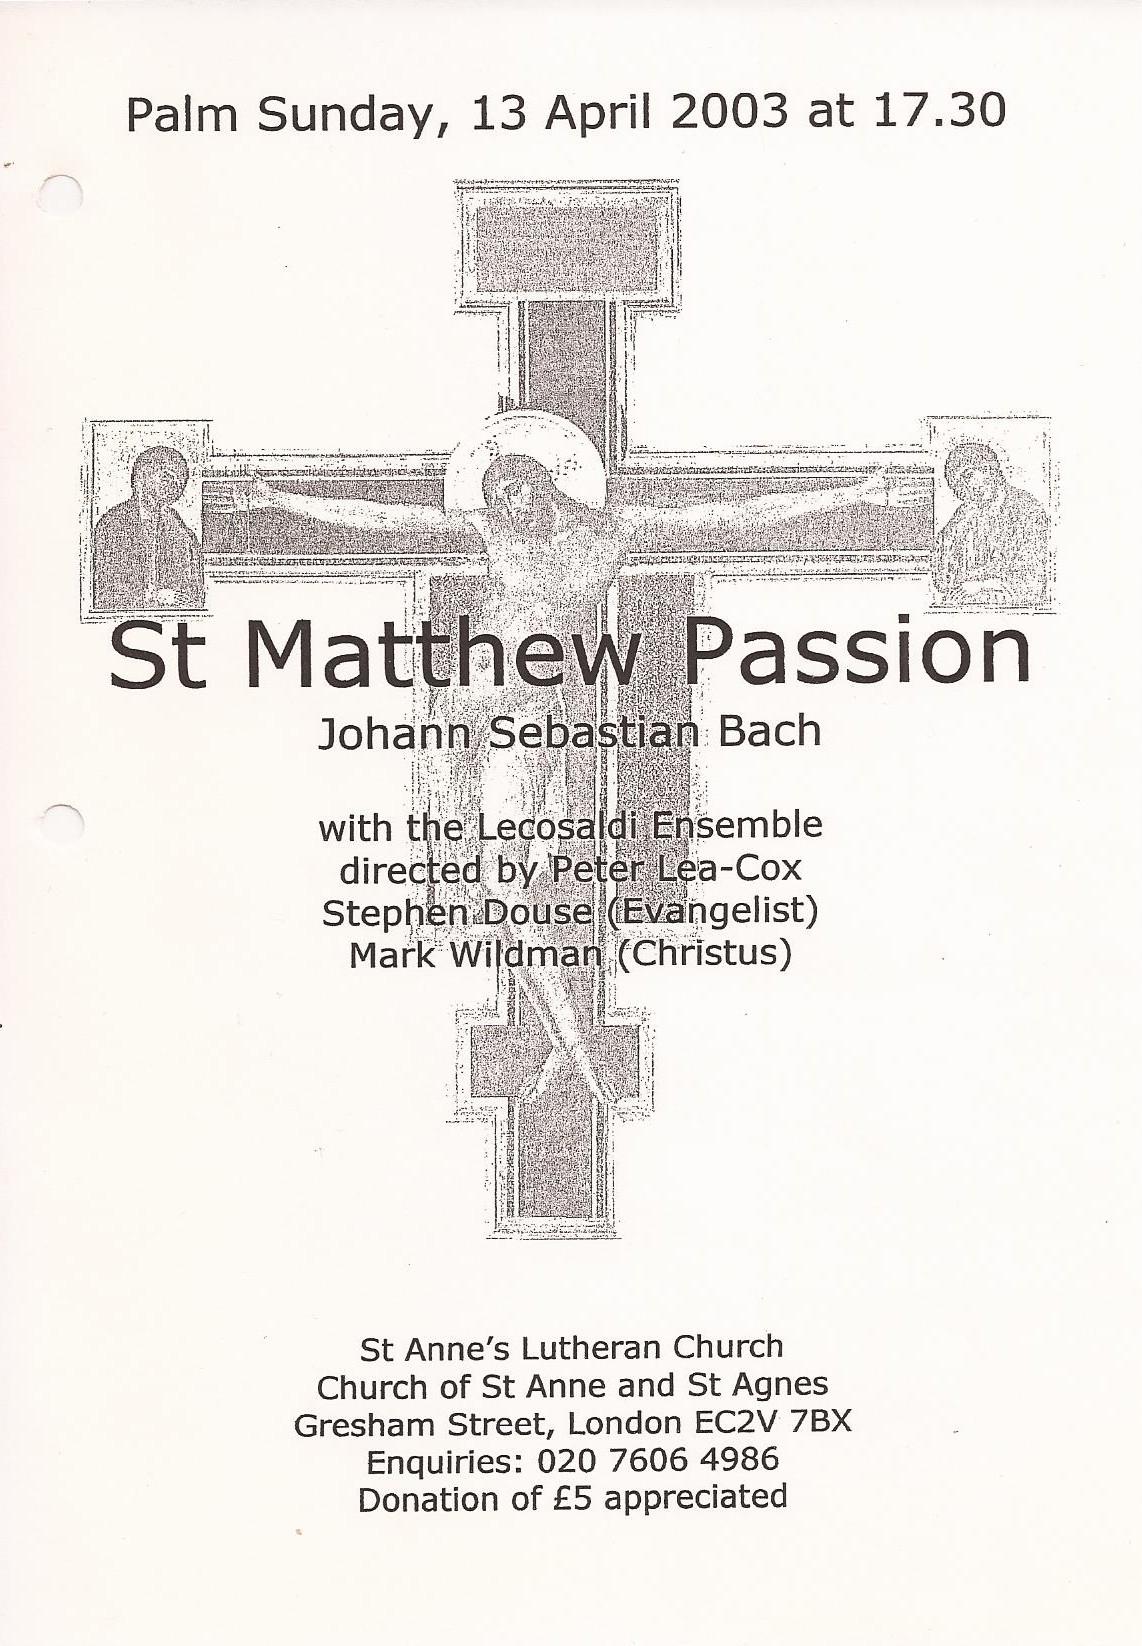 matthew-passion-april-2003